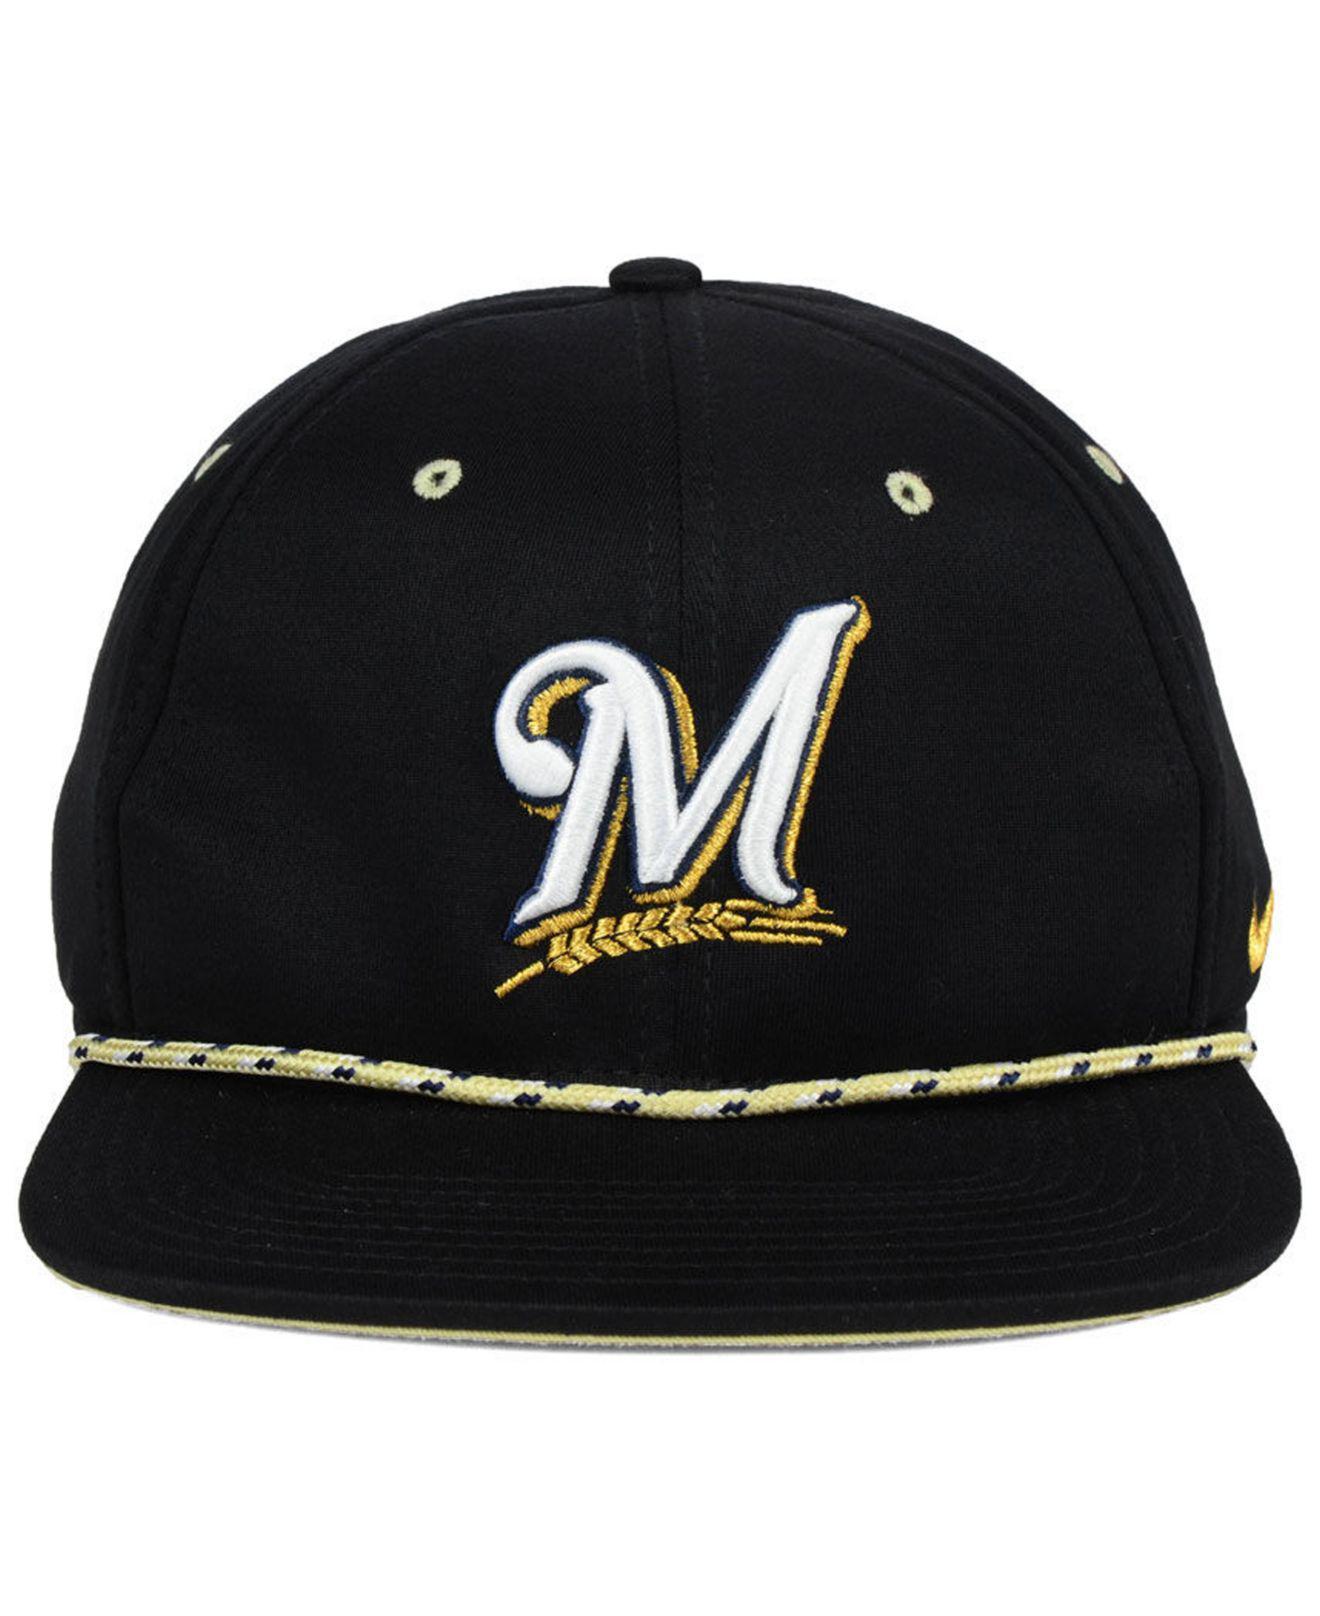 1fa50903 ... true snapback adjustable hat white f0975 5c288; sweden lyst nike  milwaukee brewers string bill snapback cap in black for men e35b8 c0310